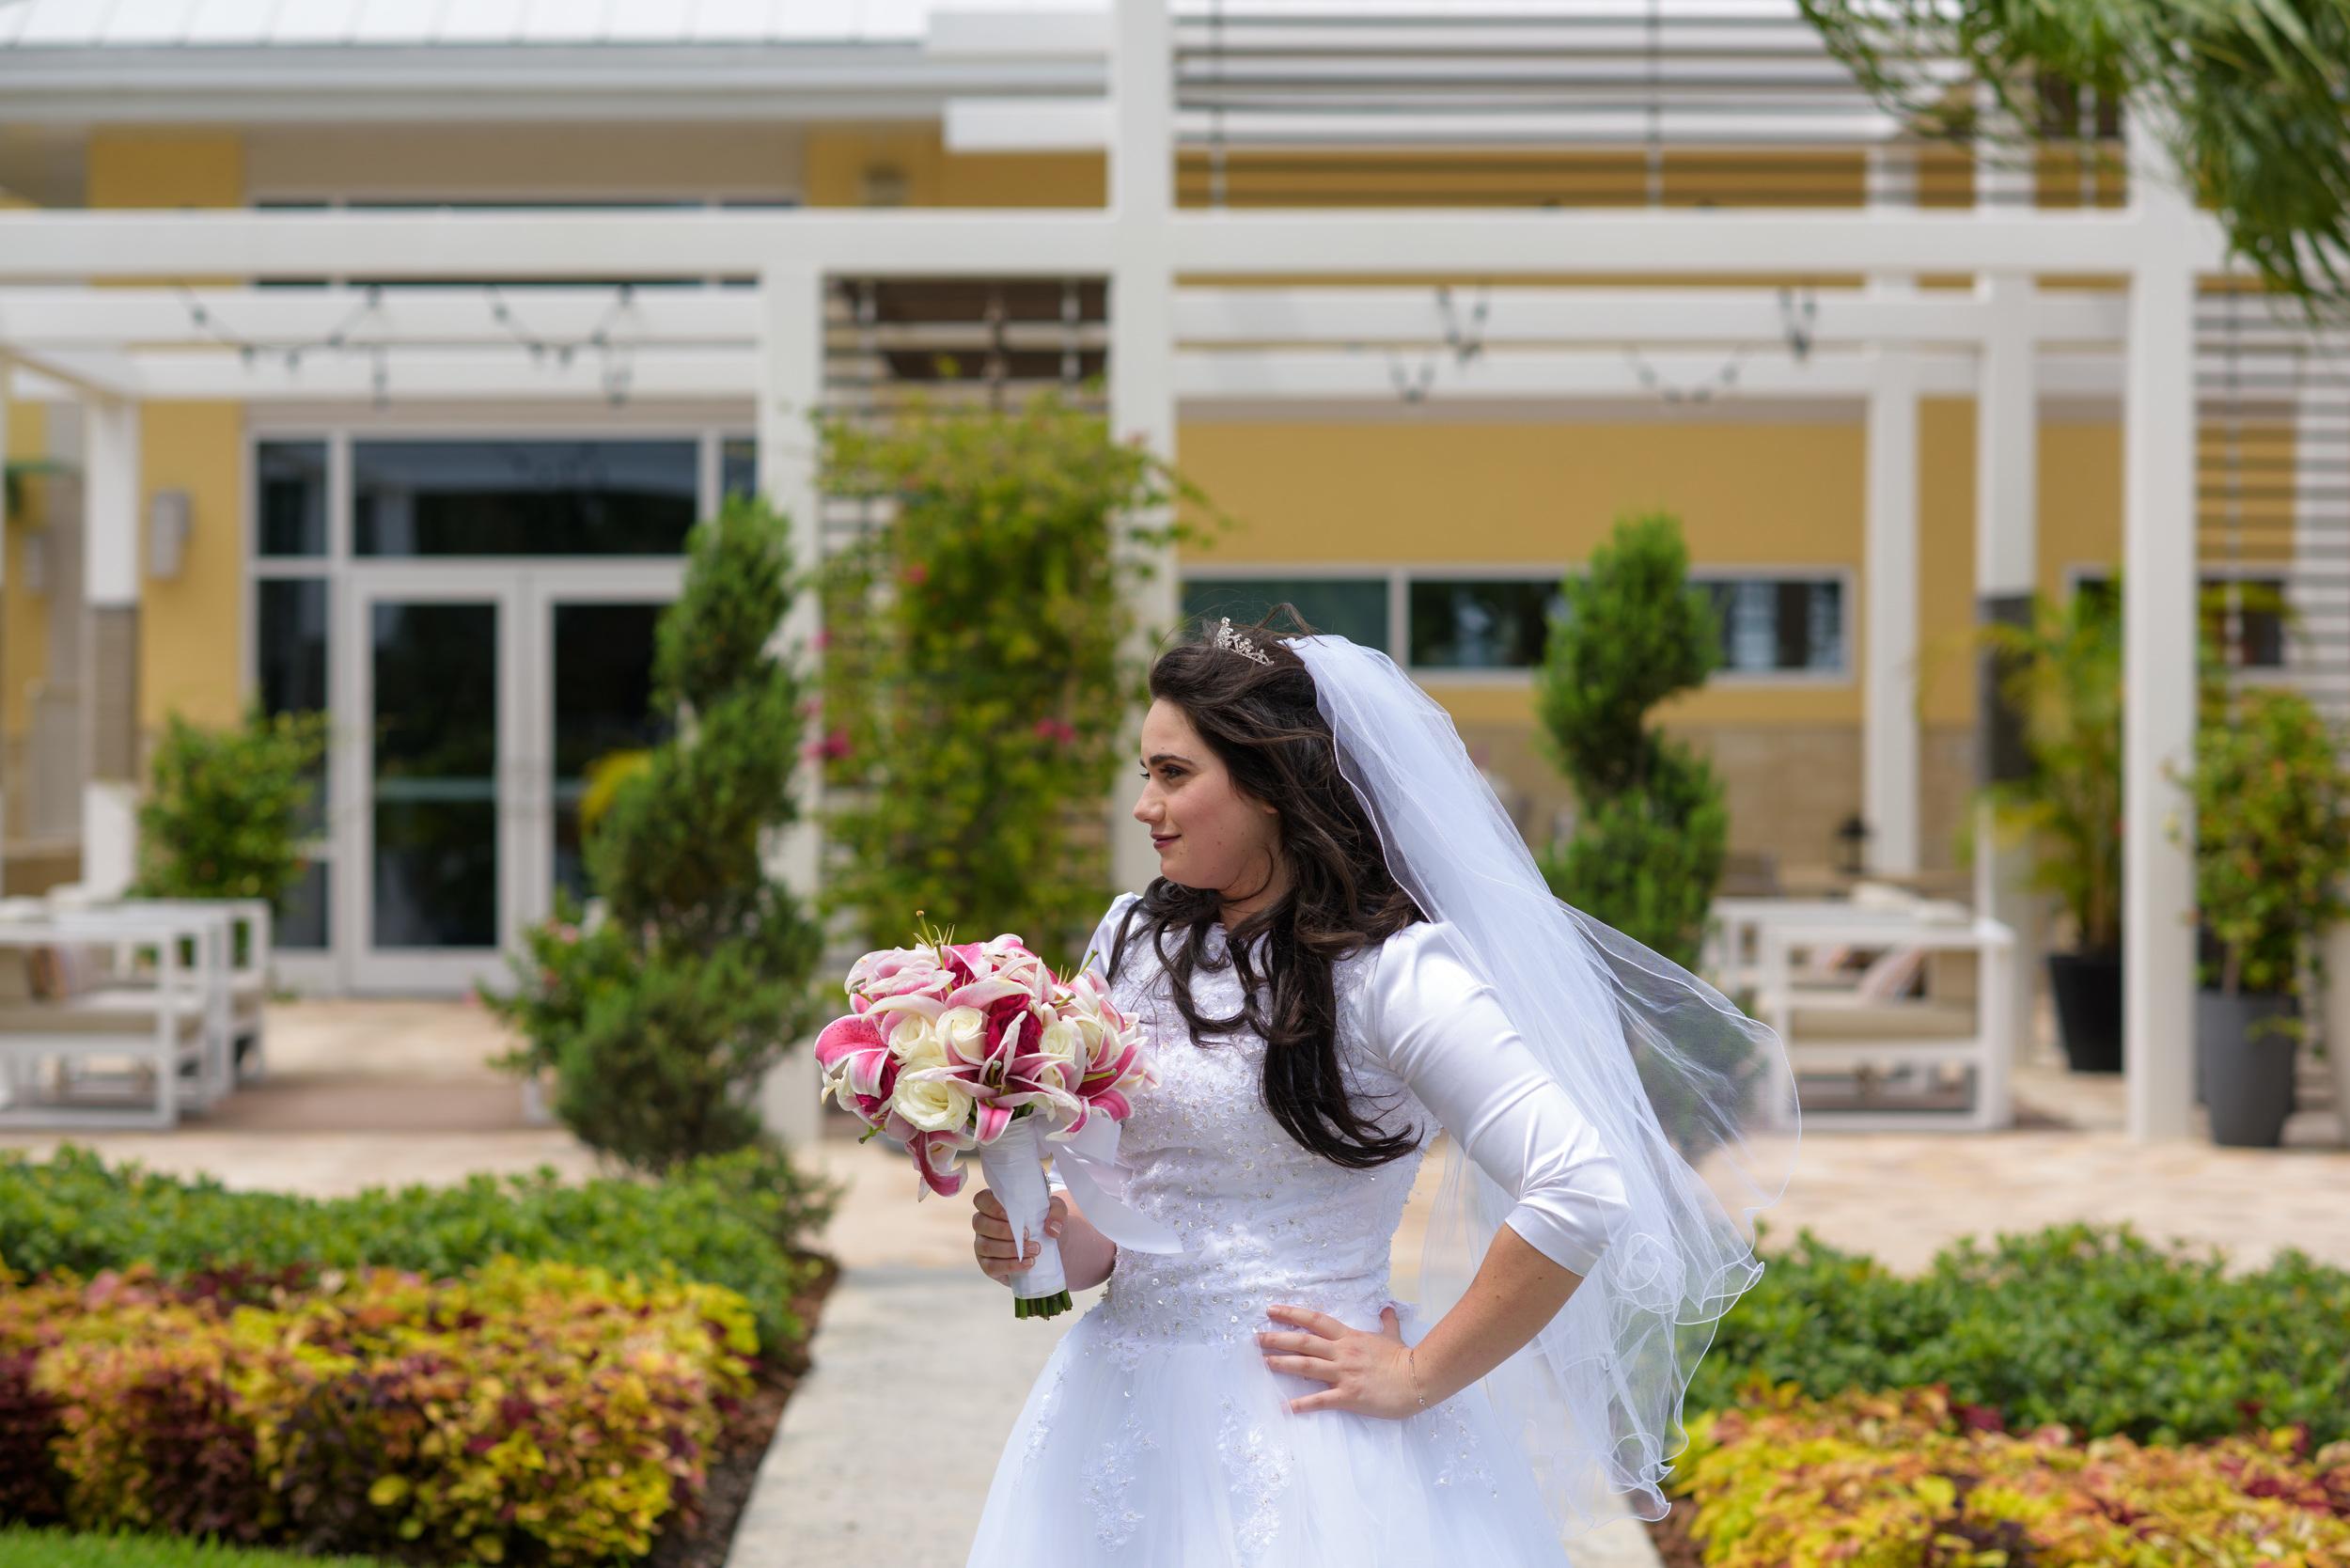 Wedding by Levikfoto.com-064.jpg